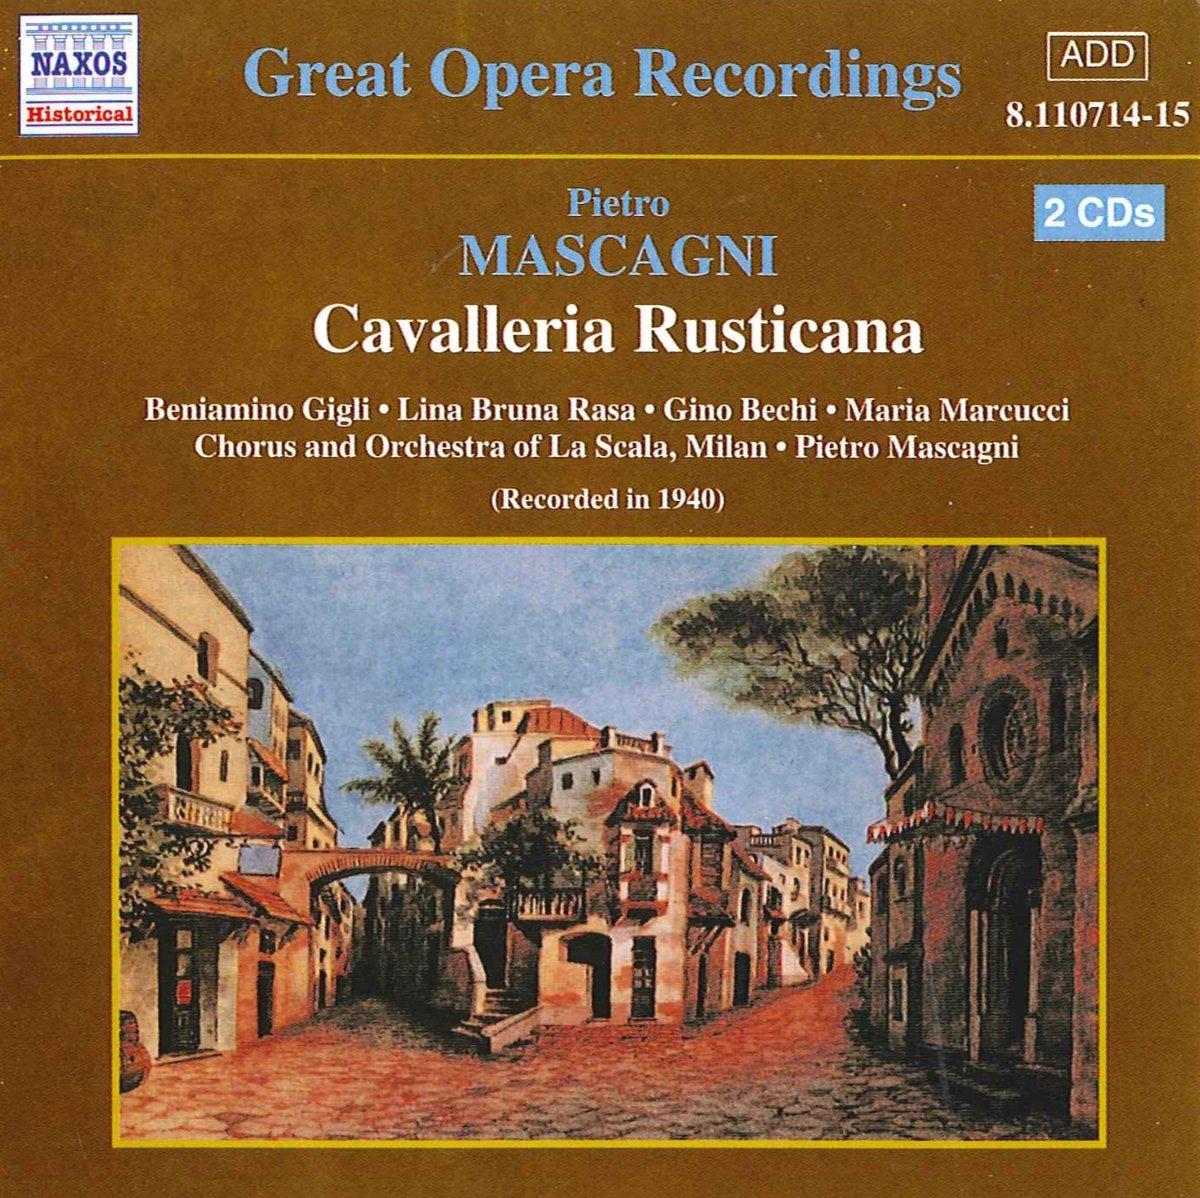 Cavalleria Rusticana by Naxos